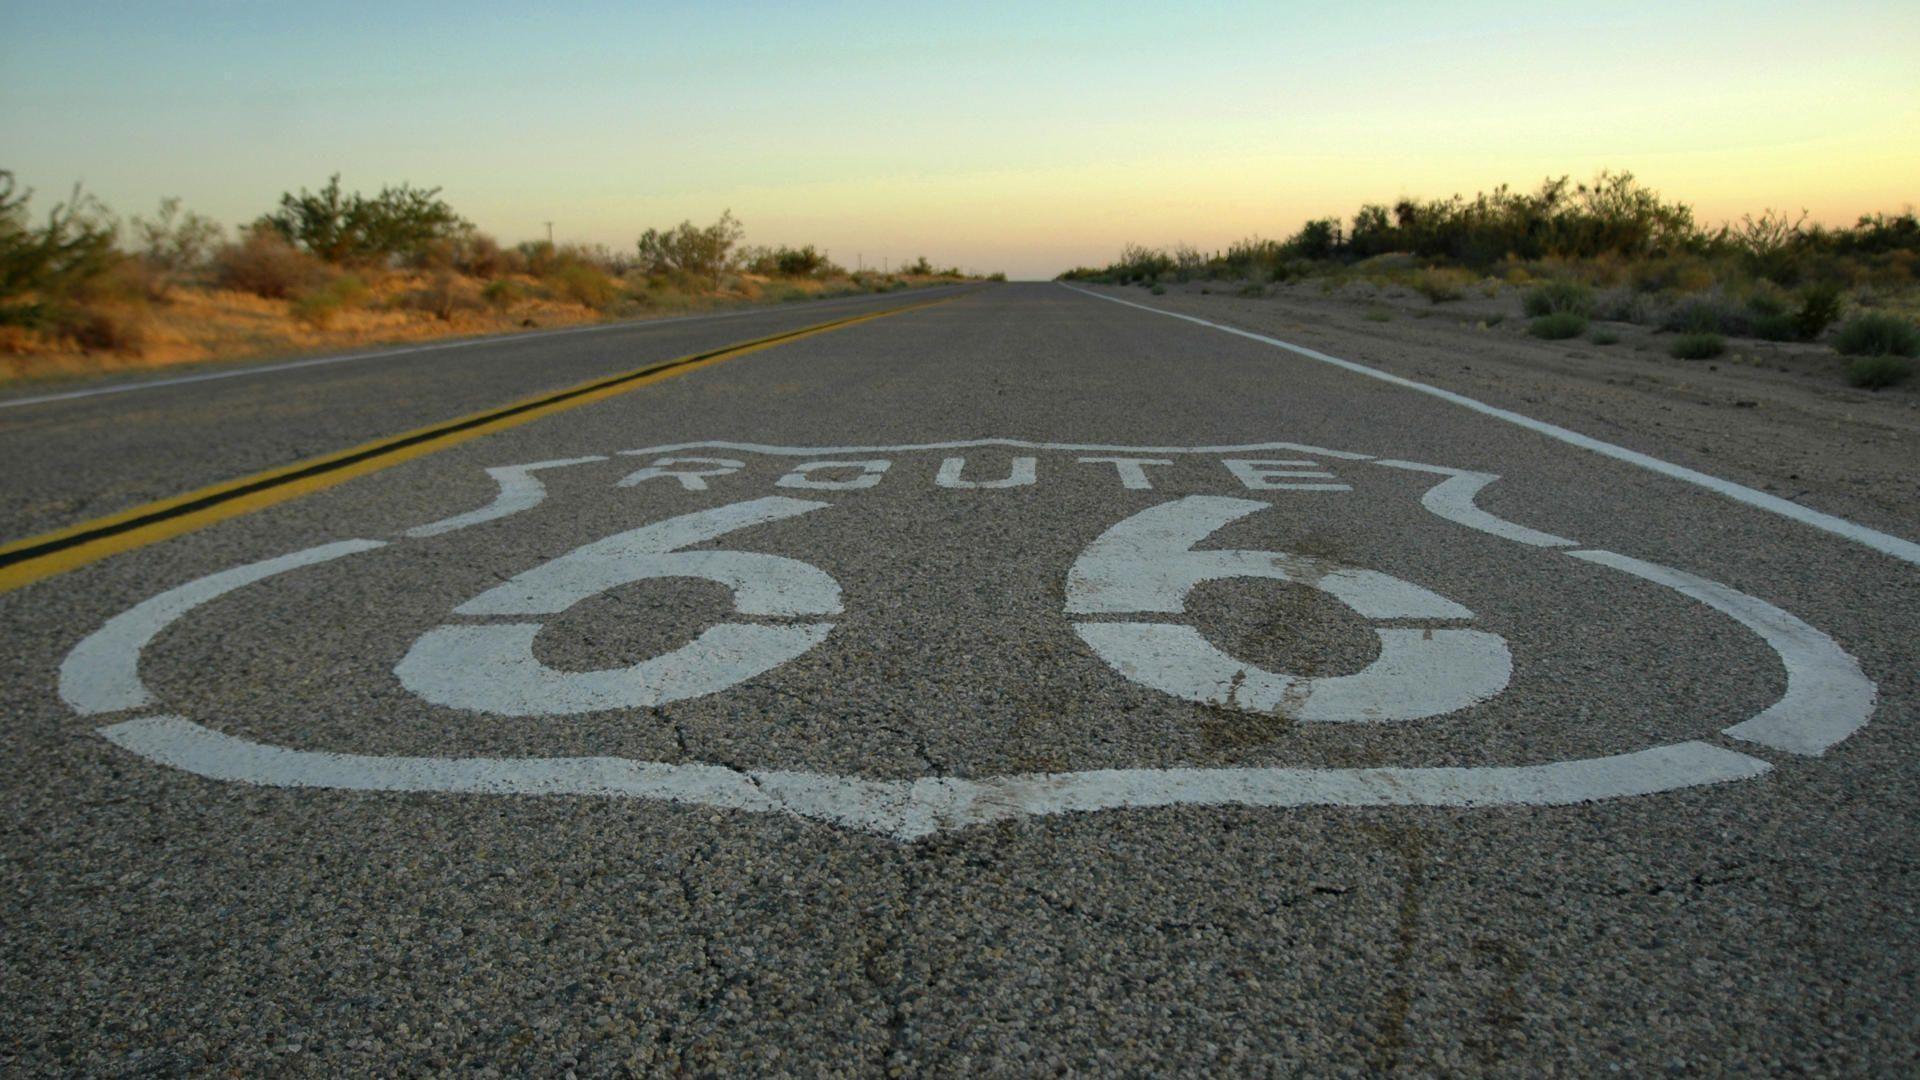 route 66 wallpaper hd - photo #6